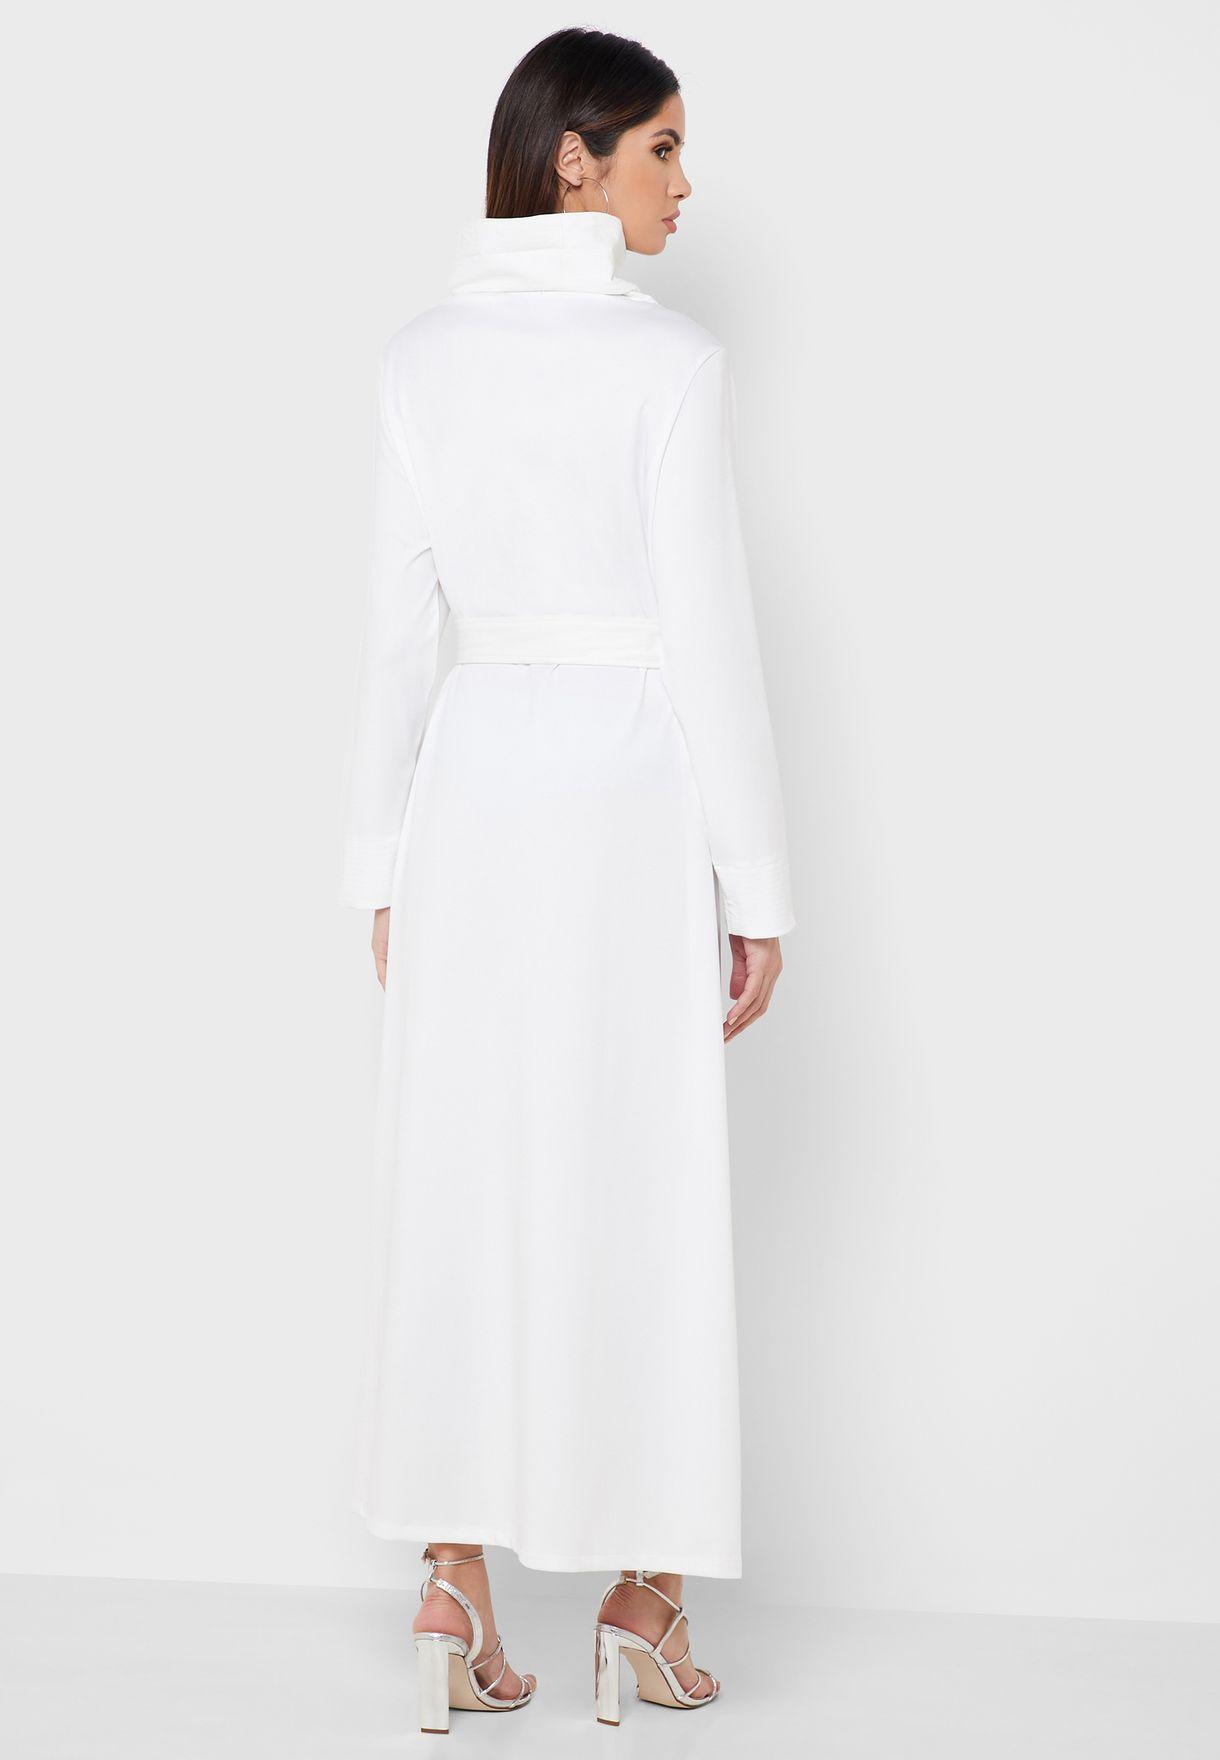 Asymmetrical High Neck Dress